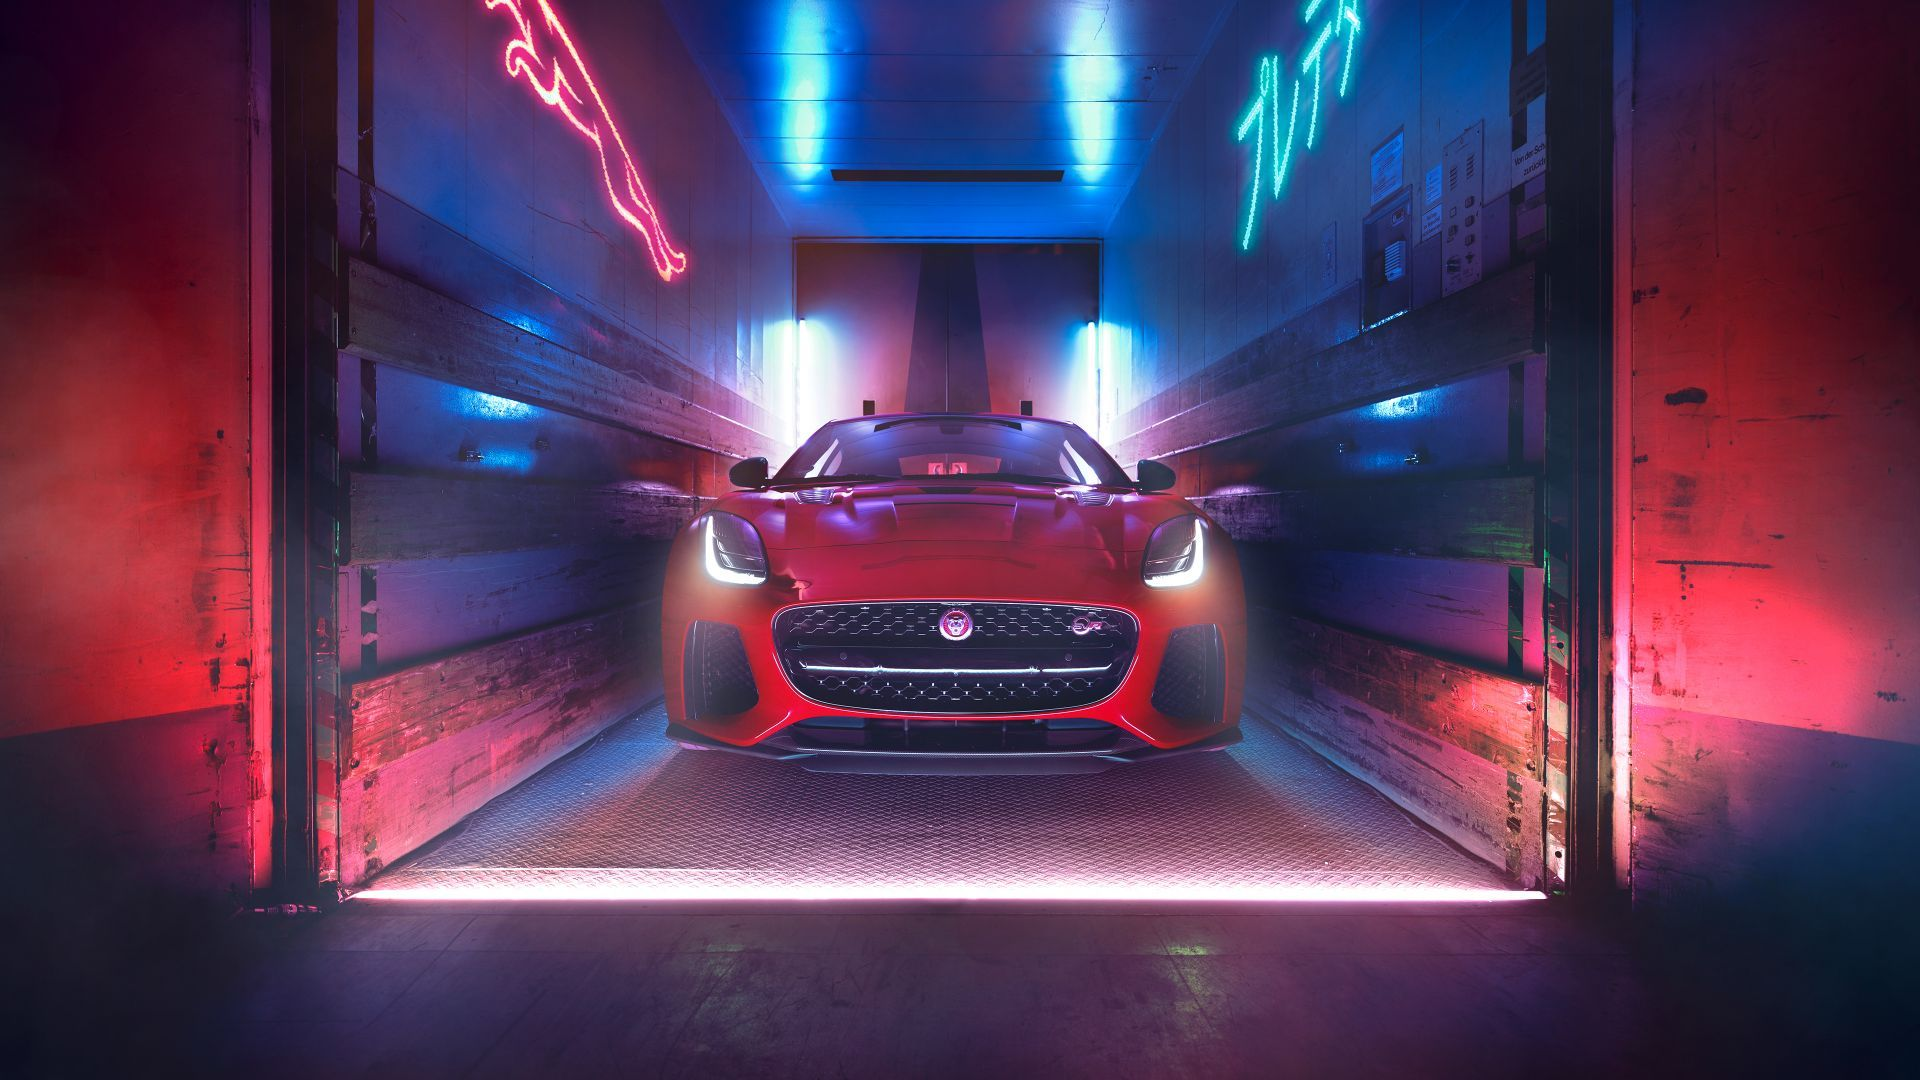 Jaguar F Type 2019 Cars Luxury Cars 4k Horizontal In